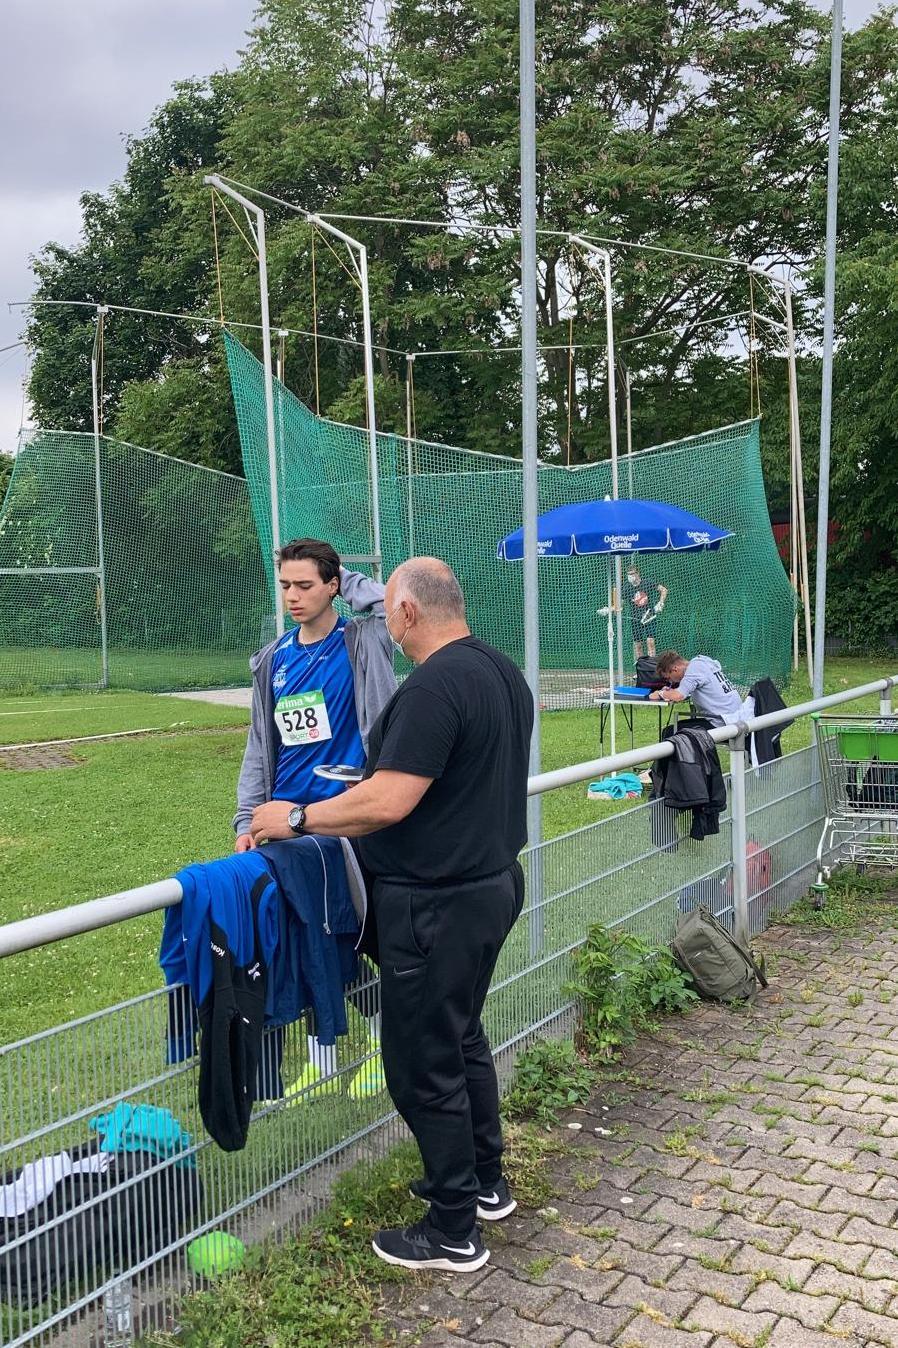 06.06 Kadersportfest Jugend Mannheim